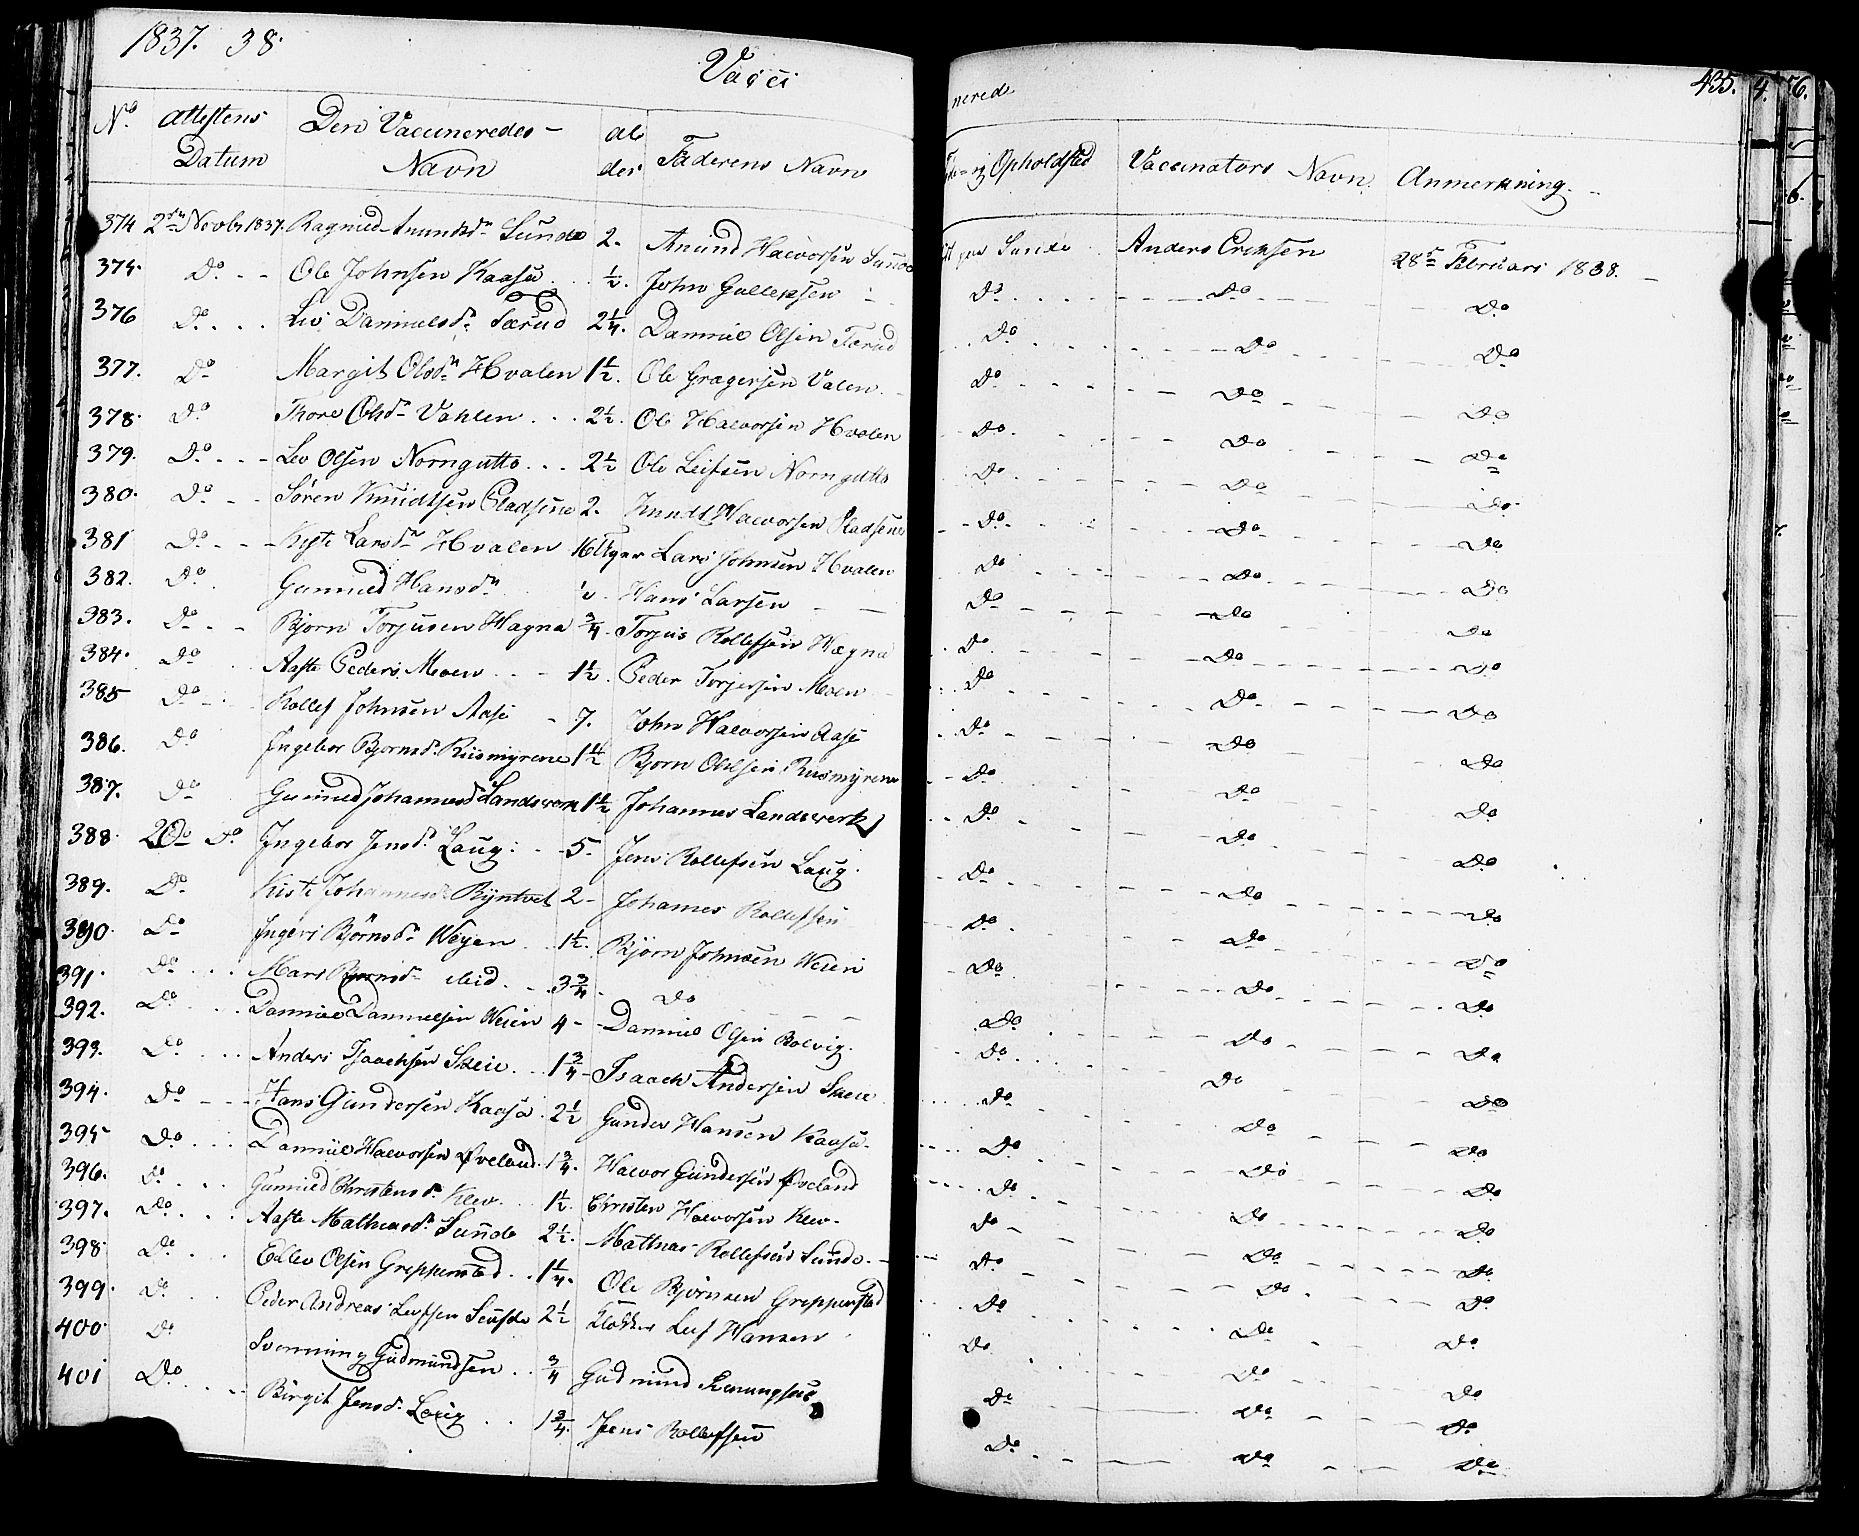 SAKO, Sauherad kirkebøker, F/Fa/L0006: Ministerialbok nr. I 6, 1827-1850, s. 435